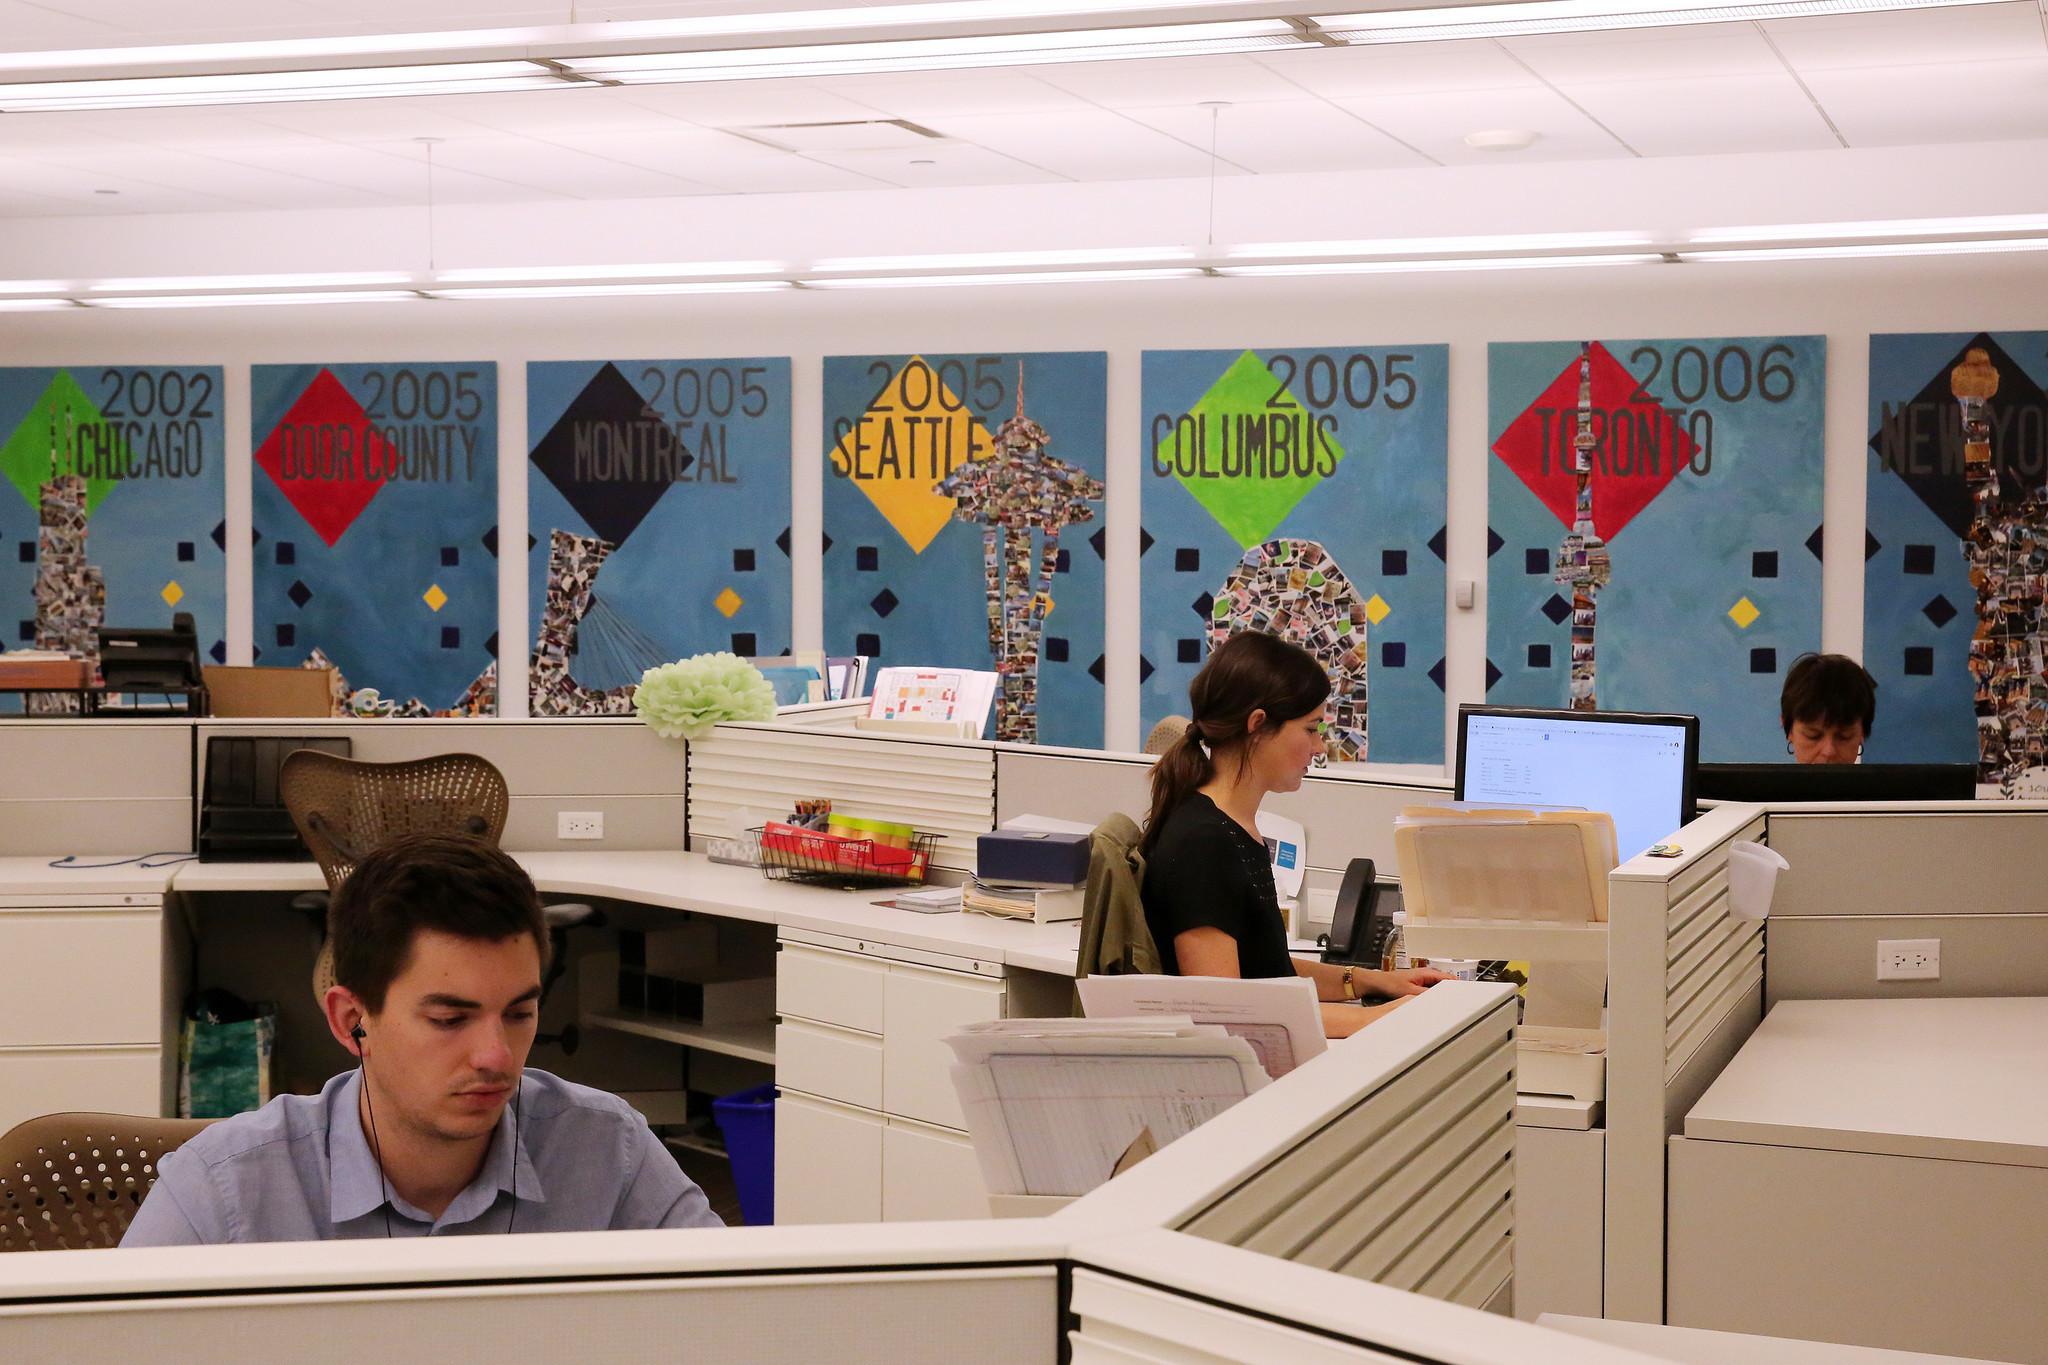 93 Interior Designer Jobs Chicago Childs Dreyfus Group Photo Of Design Room Full Size